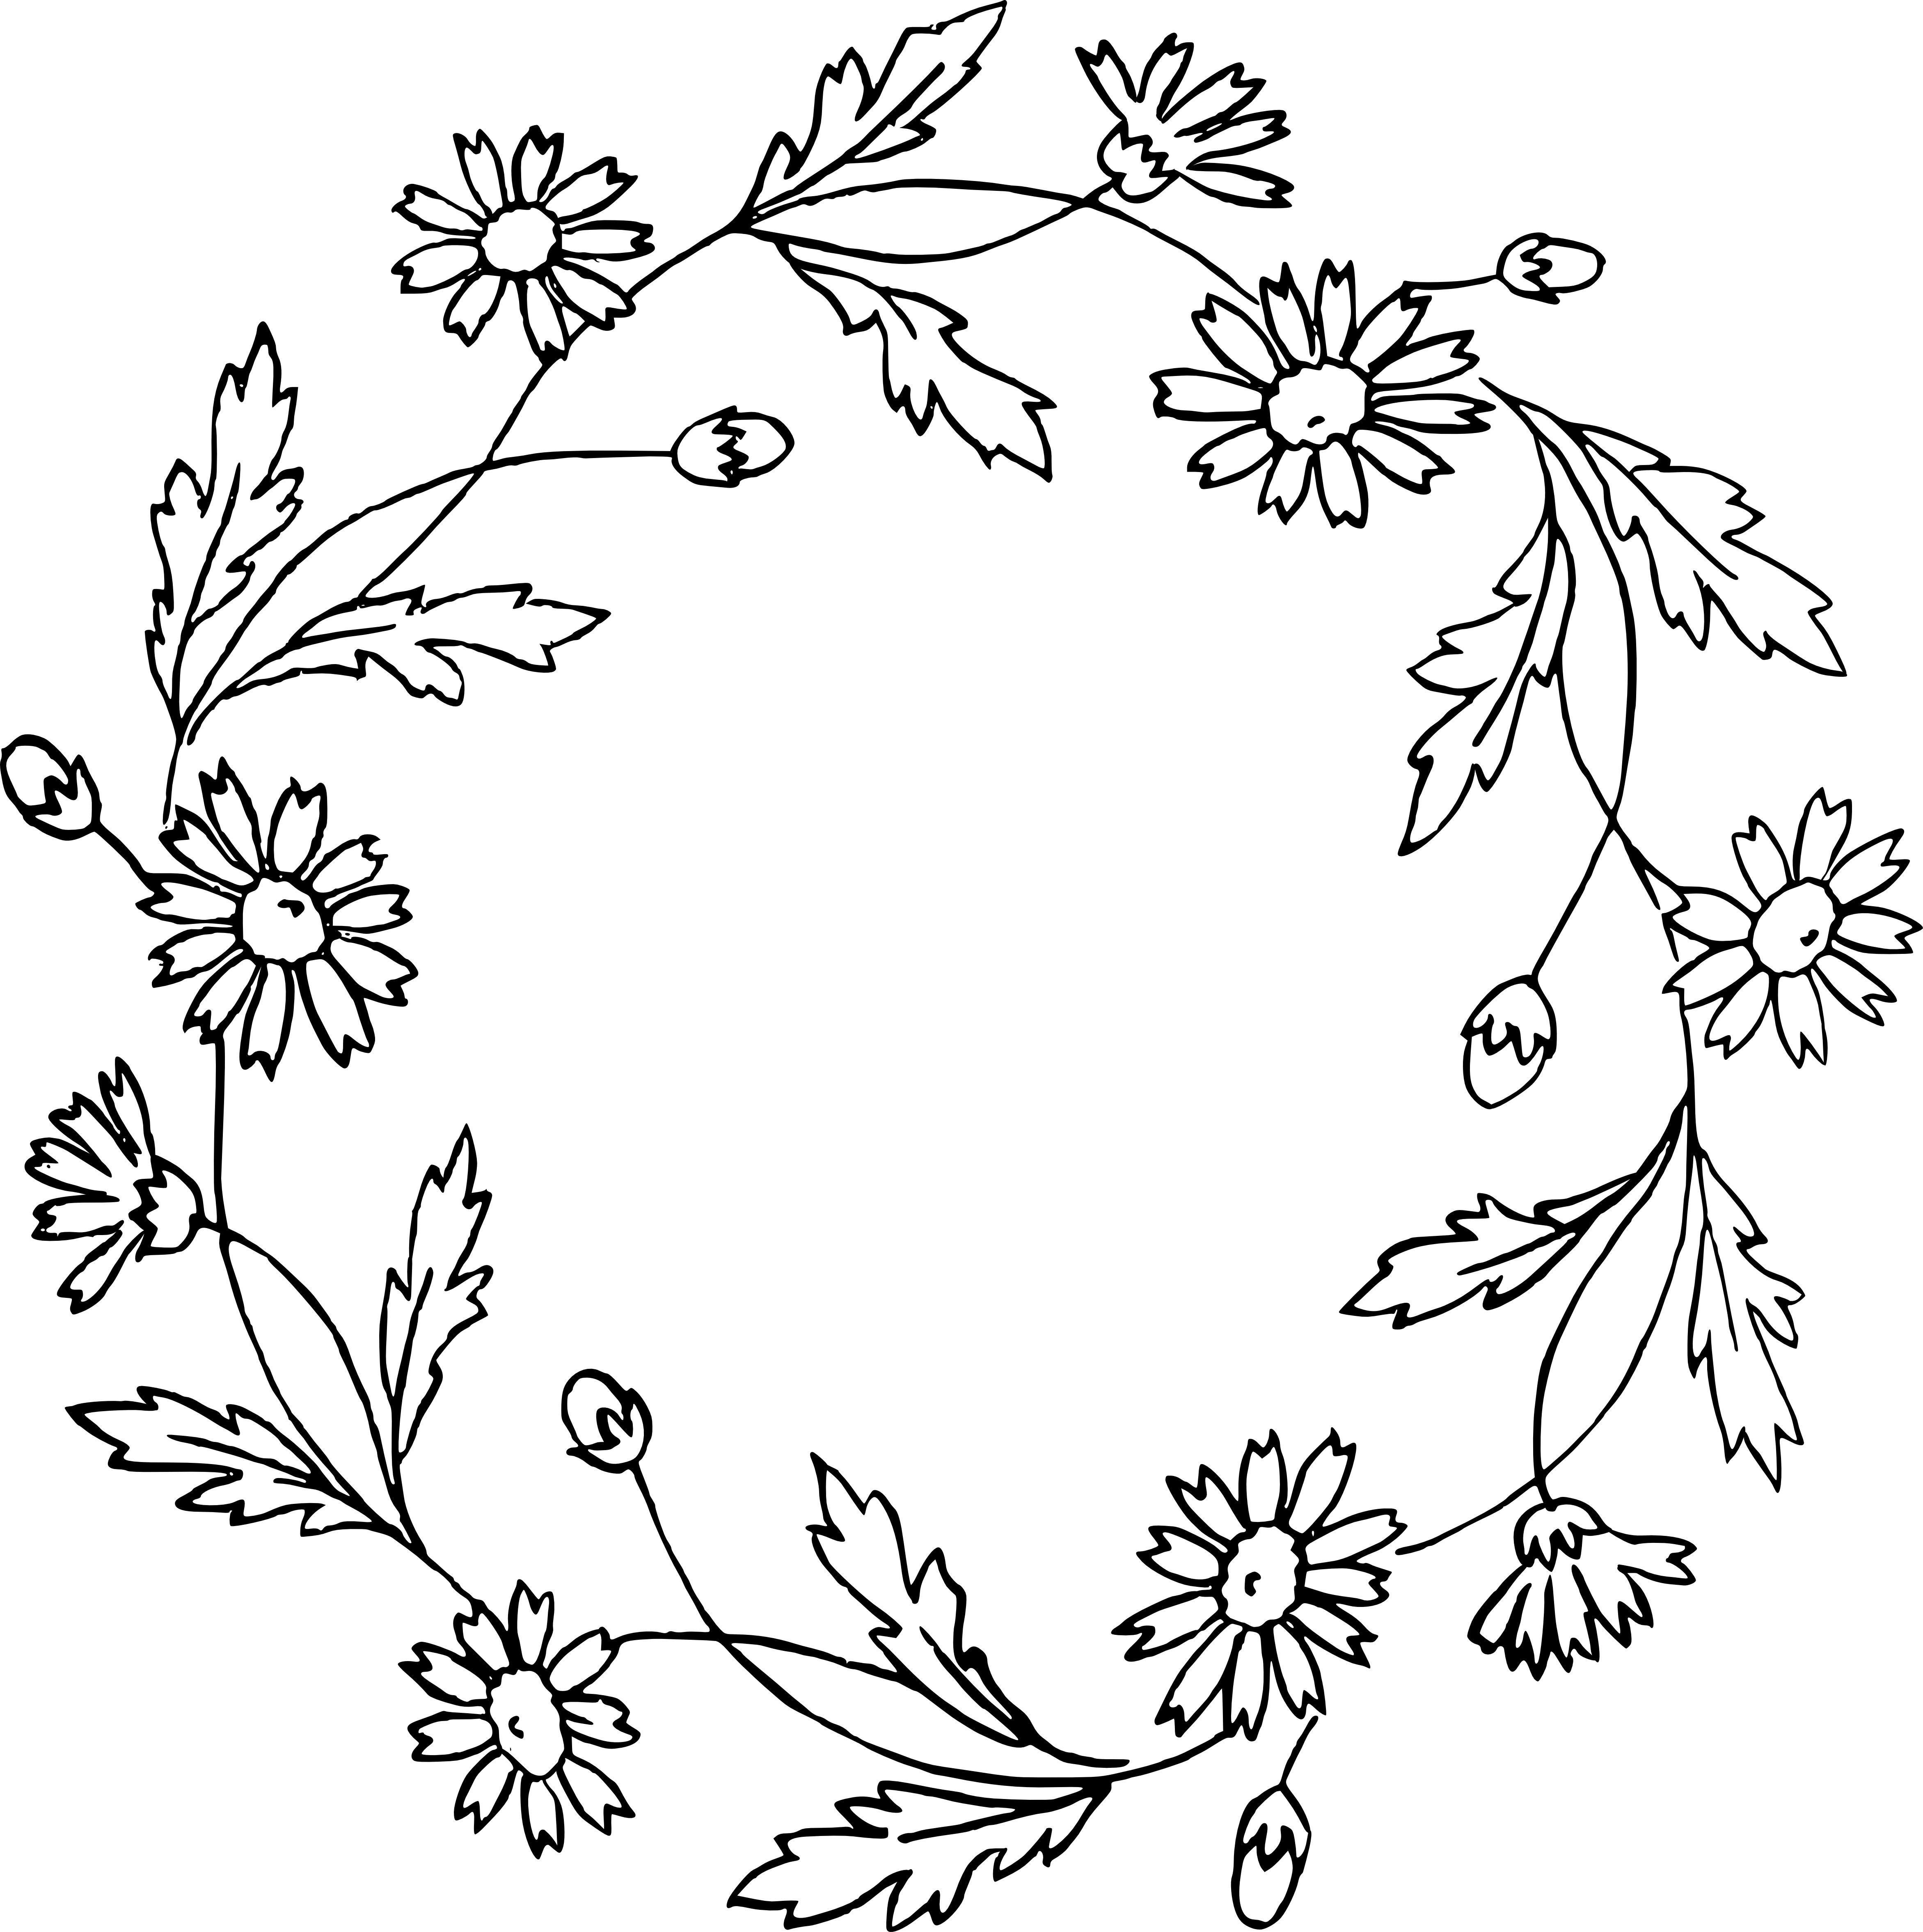 daisy flower cip art silhouette floral wreath clip art vector images 4686 4707 [ 4686 x 4707 Pixel ]